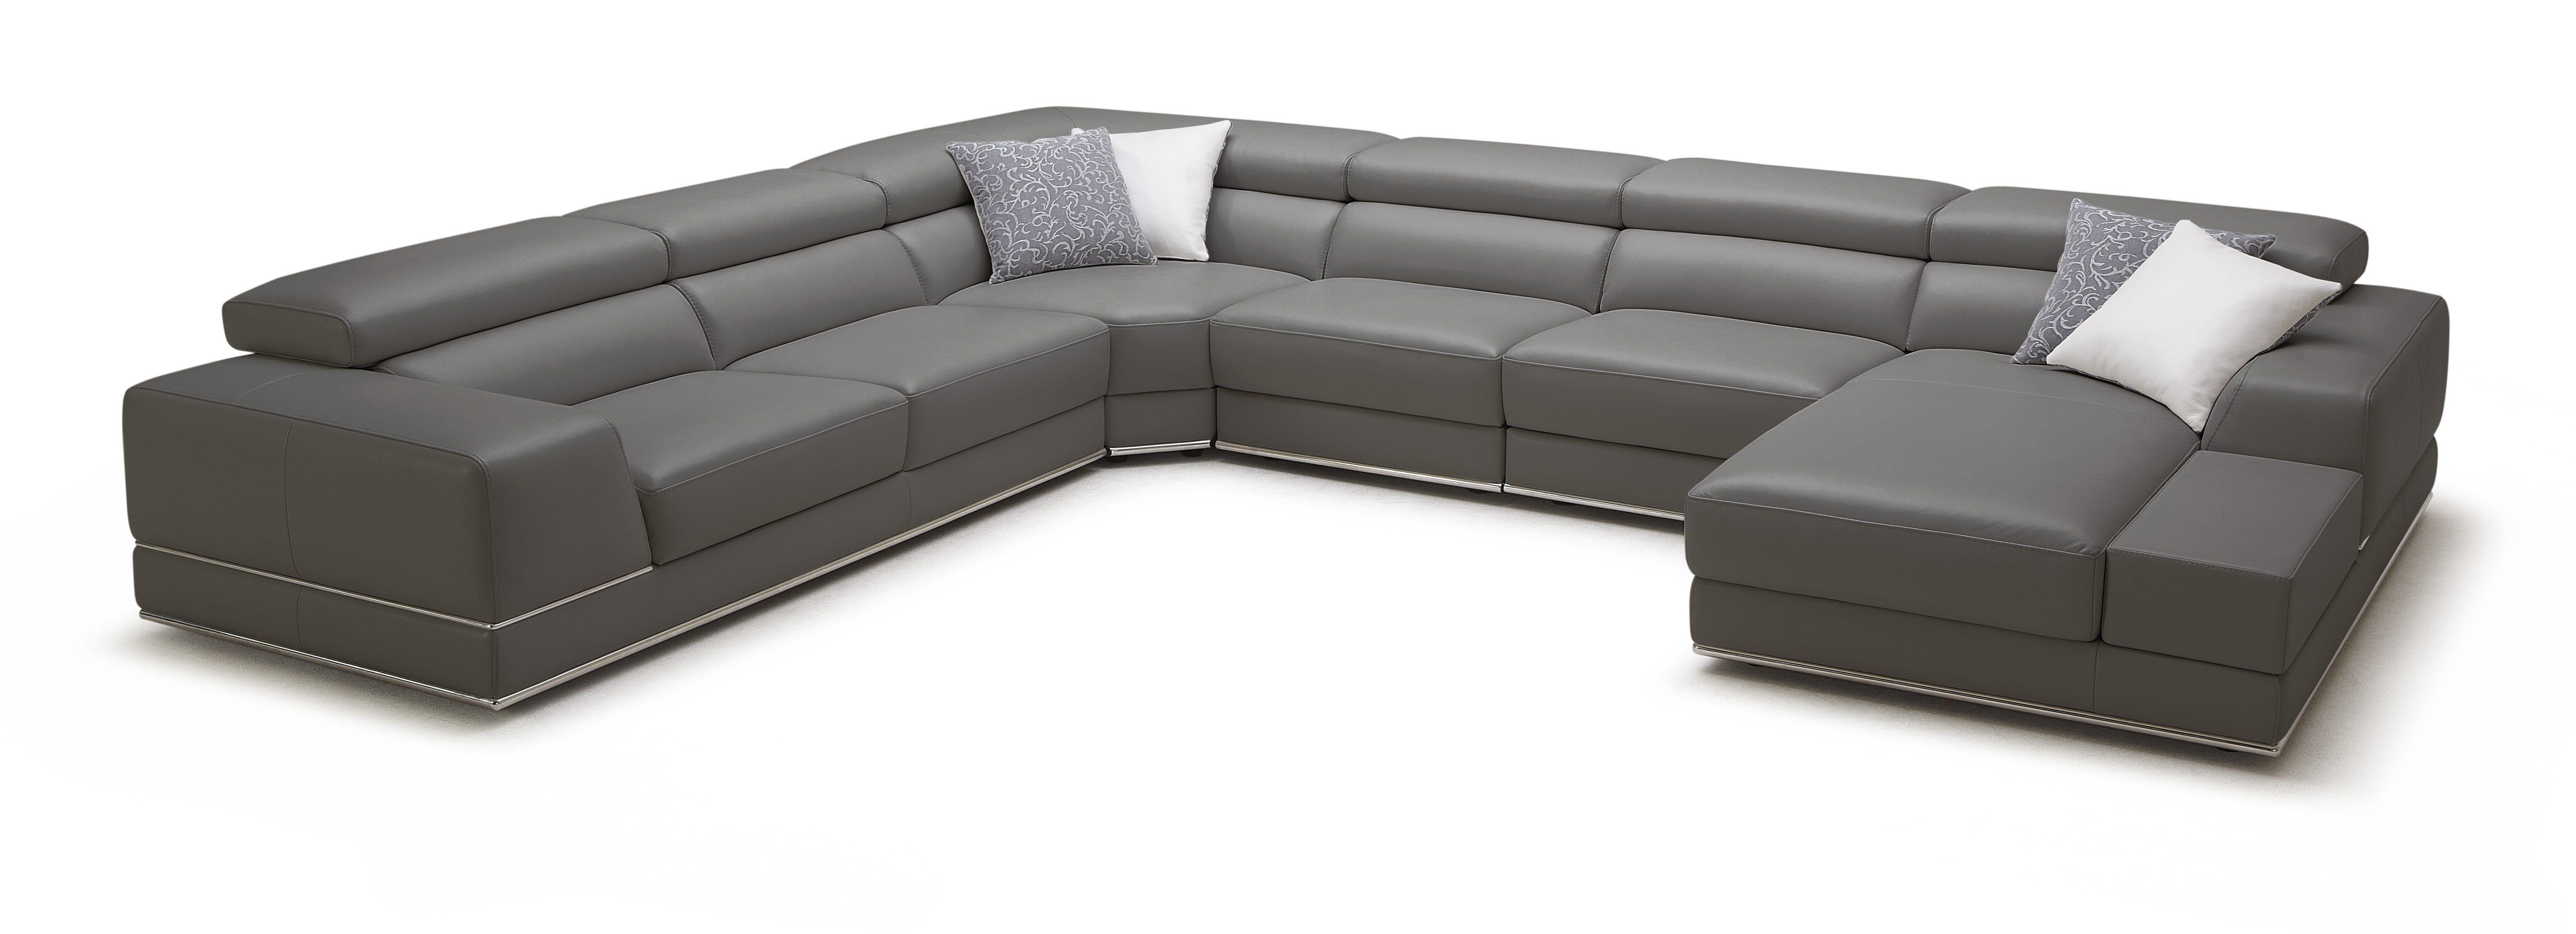 Bergamo Extended Sectional Leather Modern Sofa Elephant Gray Leather Sectional Leather Reclining Sectional Modern Leather Sofa